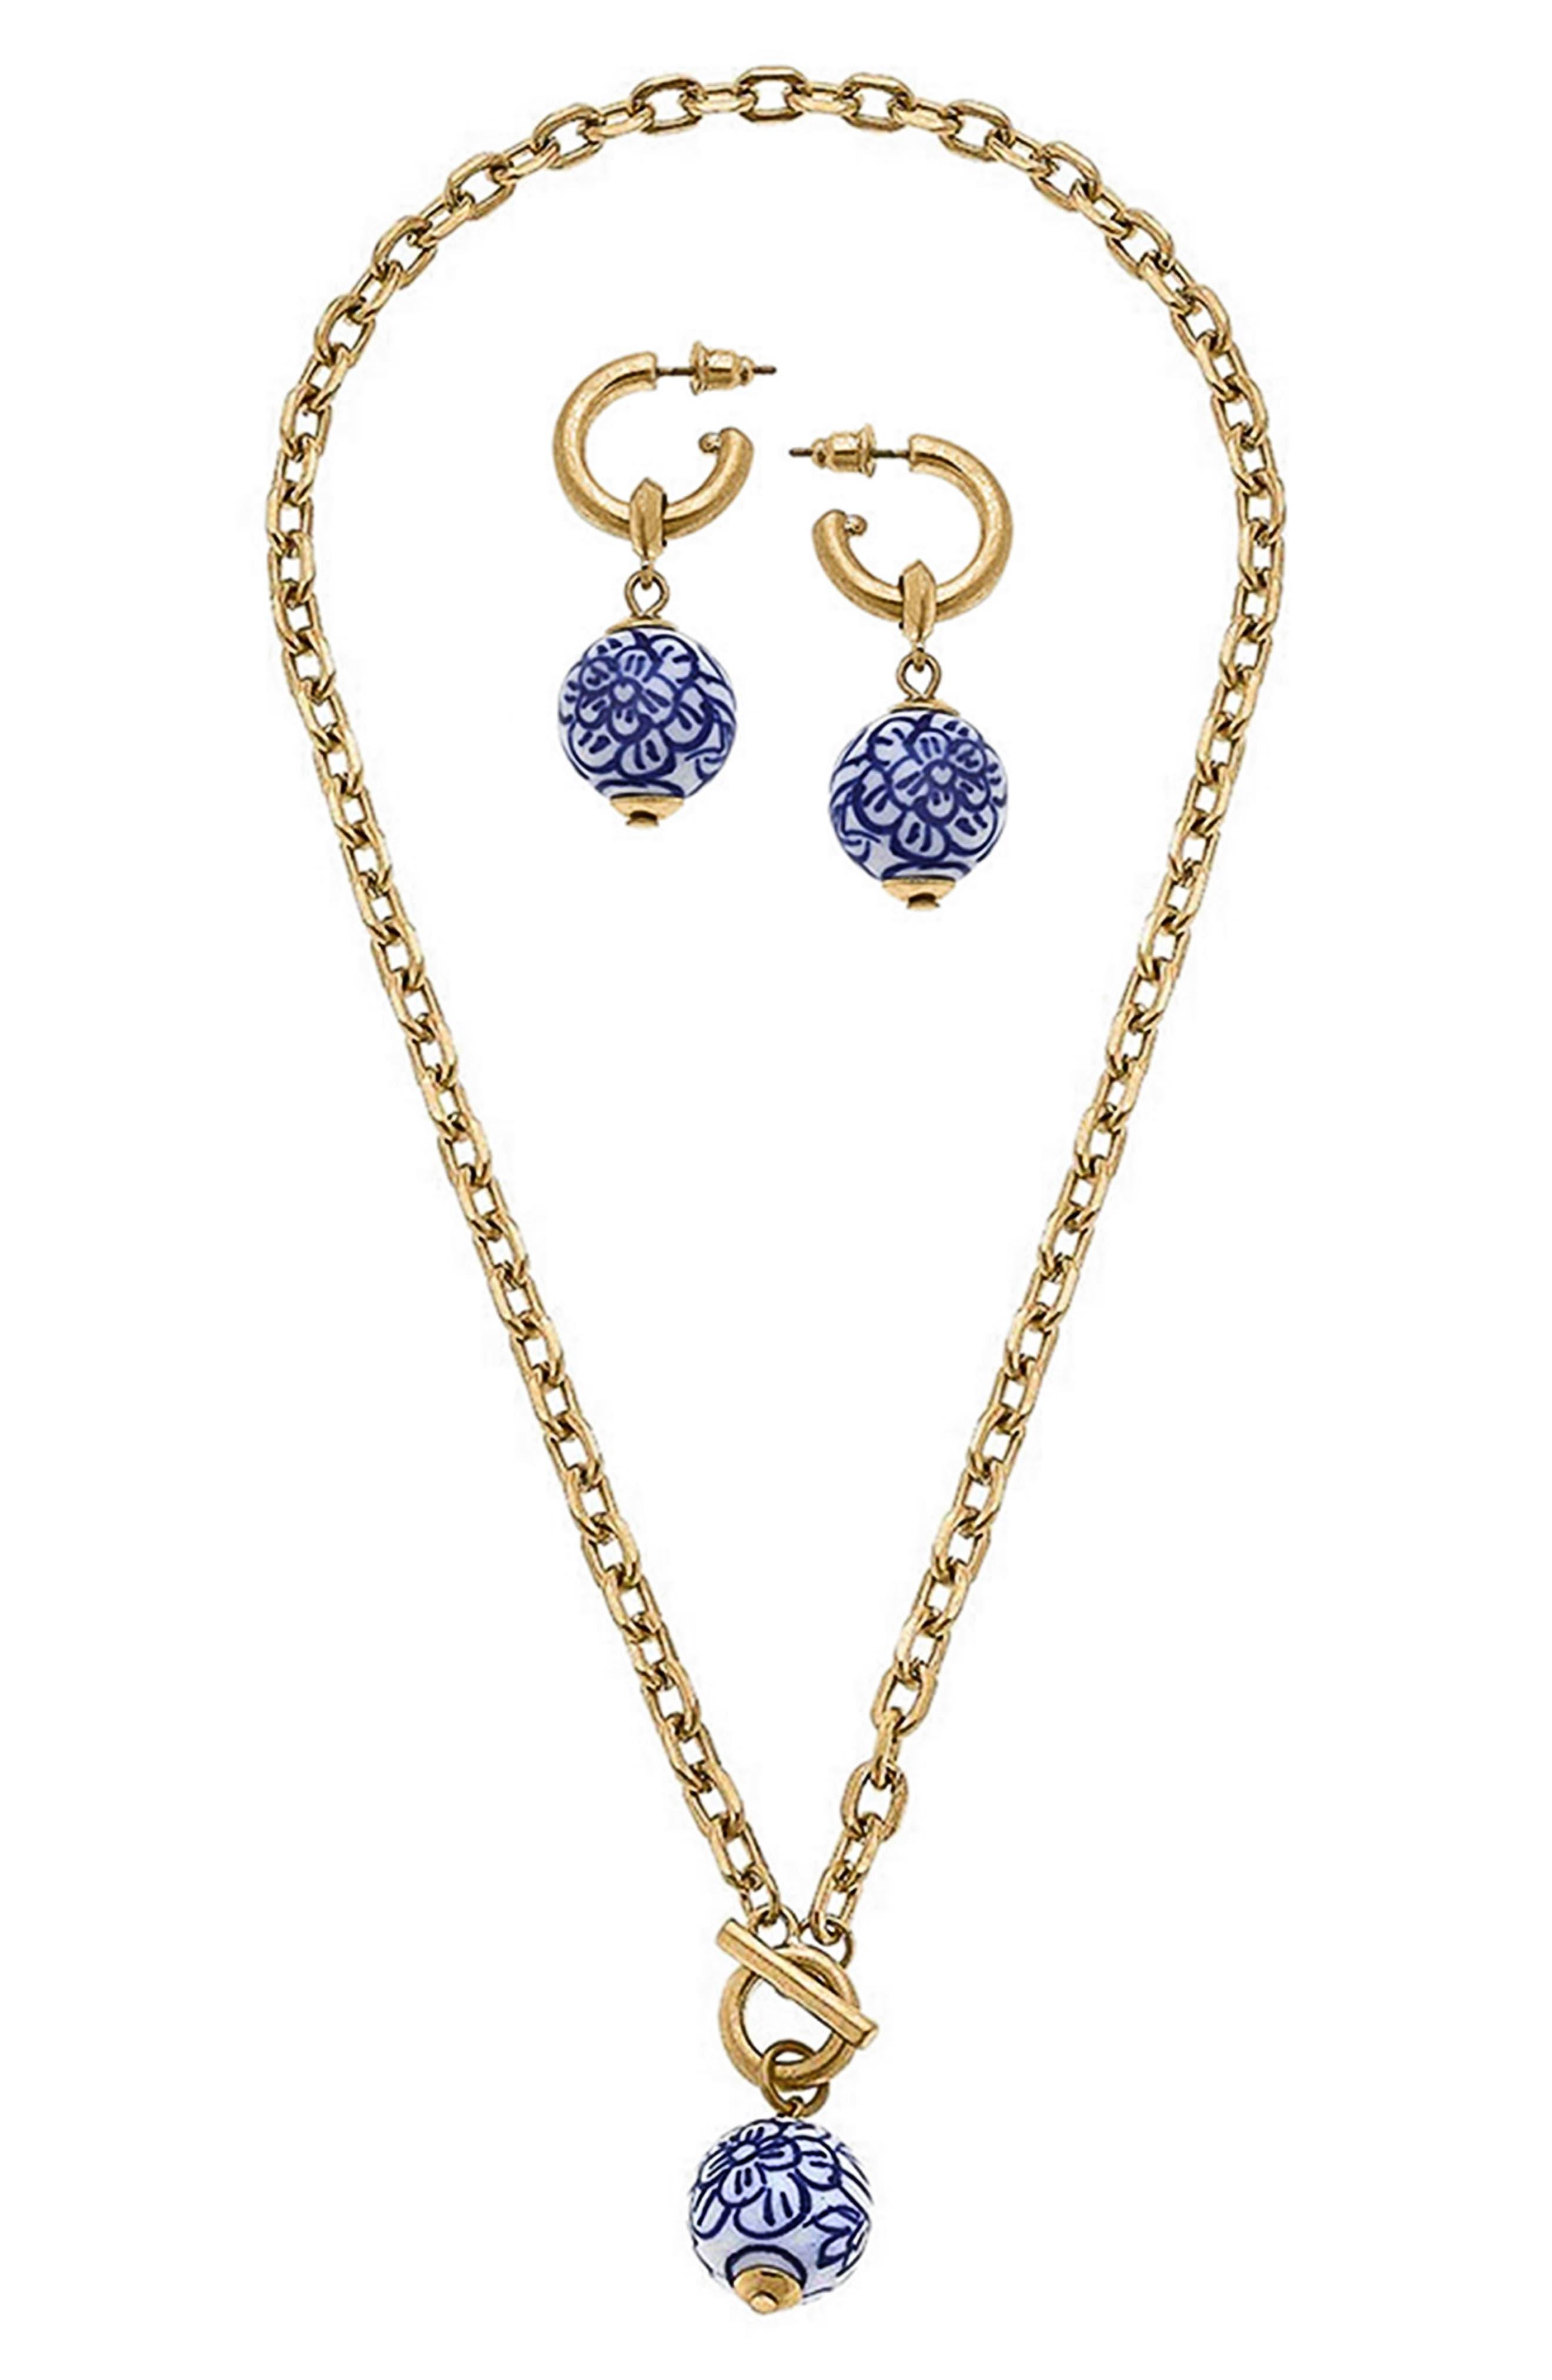 Drop Earrings & Pendant Necklace Set